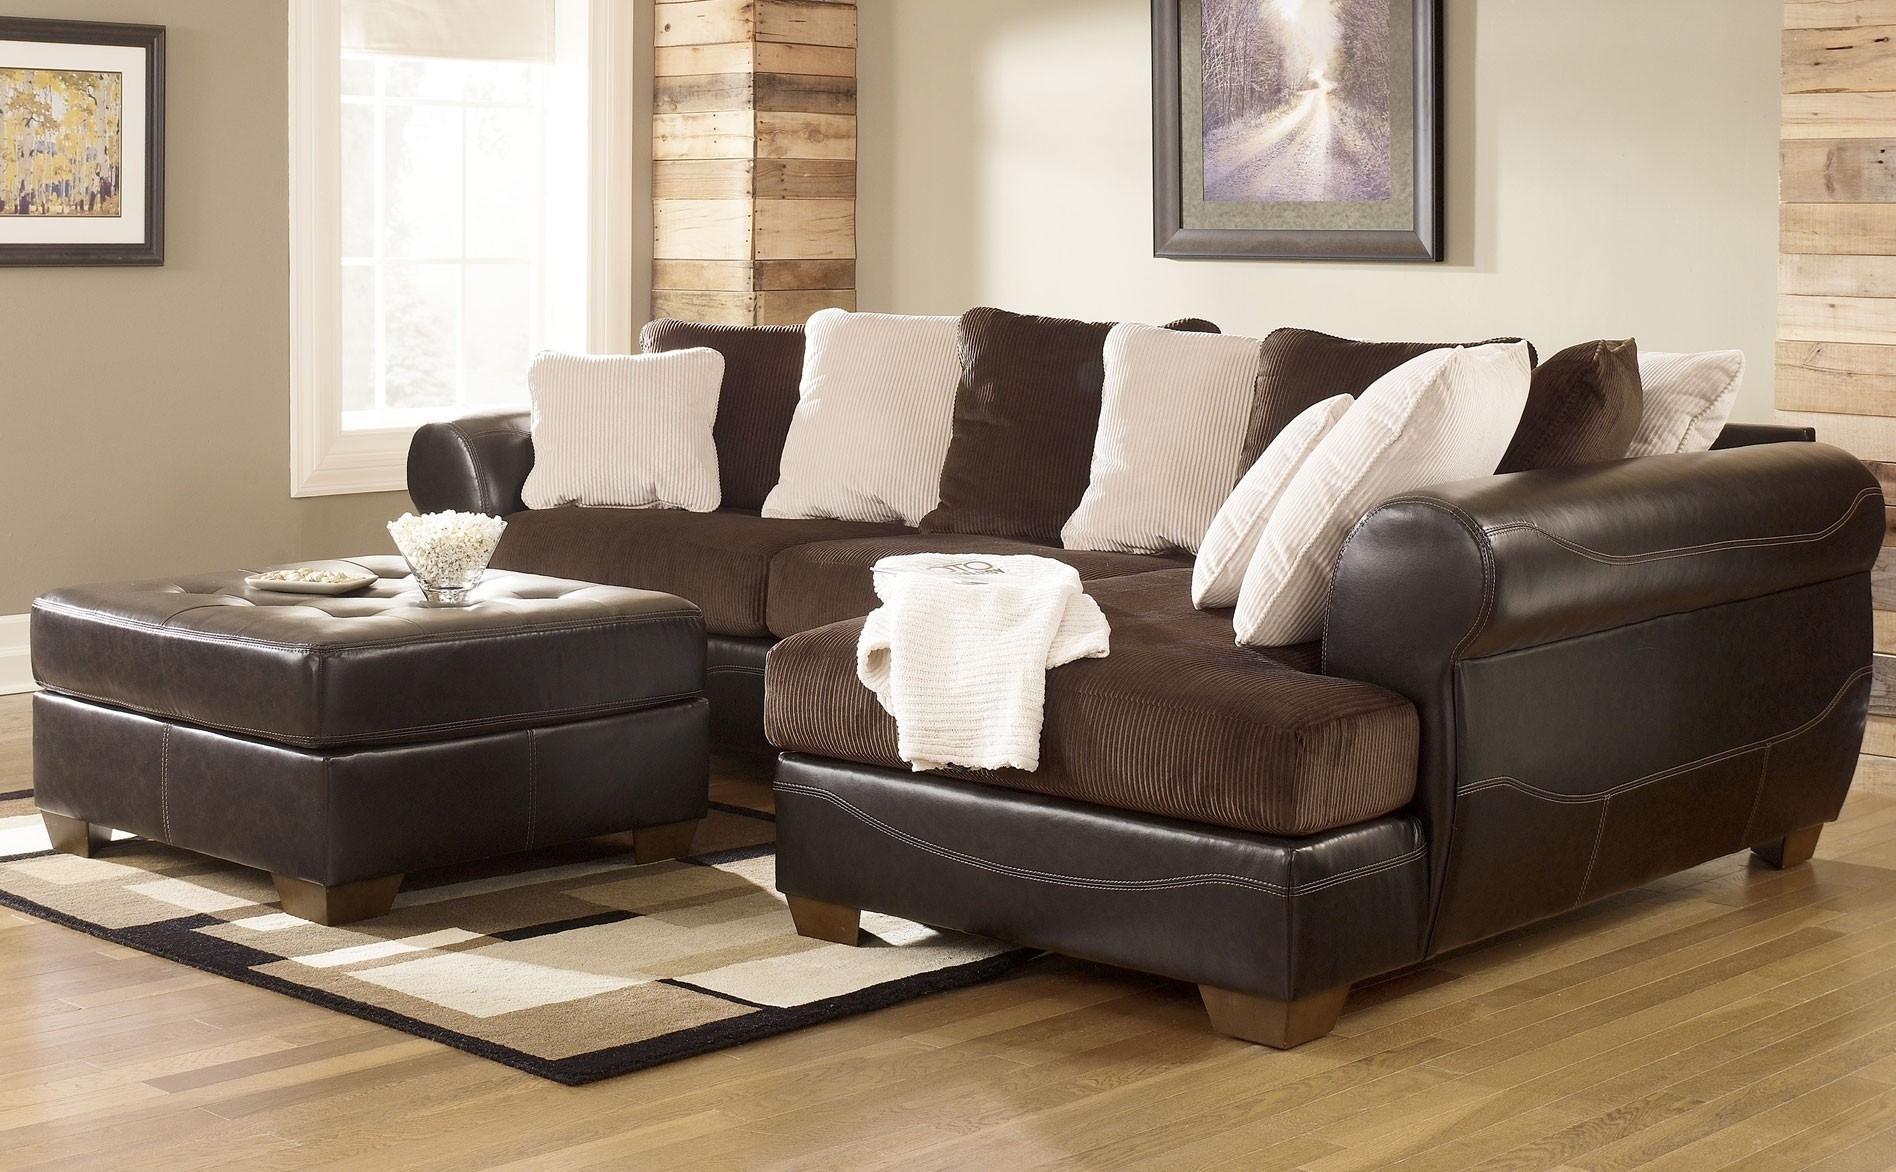 Trend Ashley Furniture Sectional Sleeper Sofa 78 In Sectional Sofas Inside Tucson Sectional Sofas (View 7 of 10)